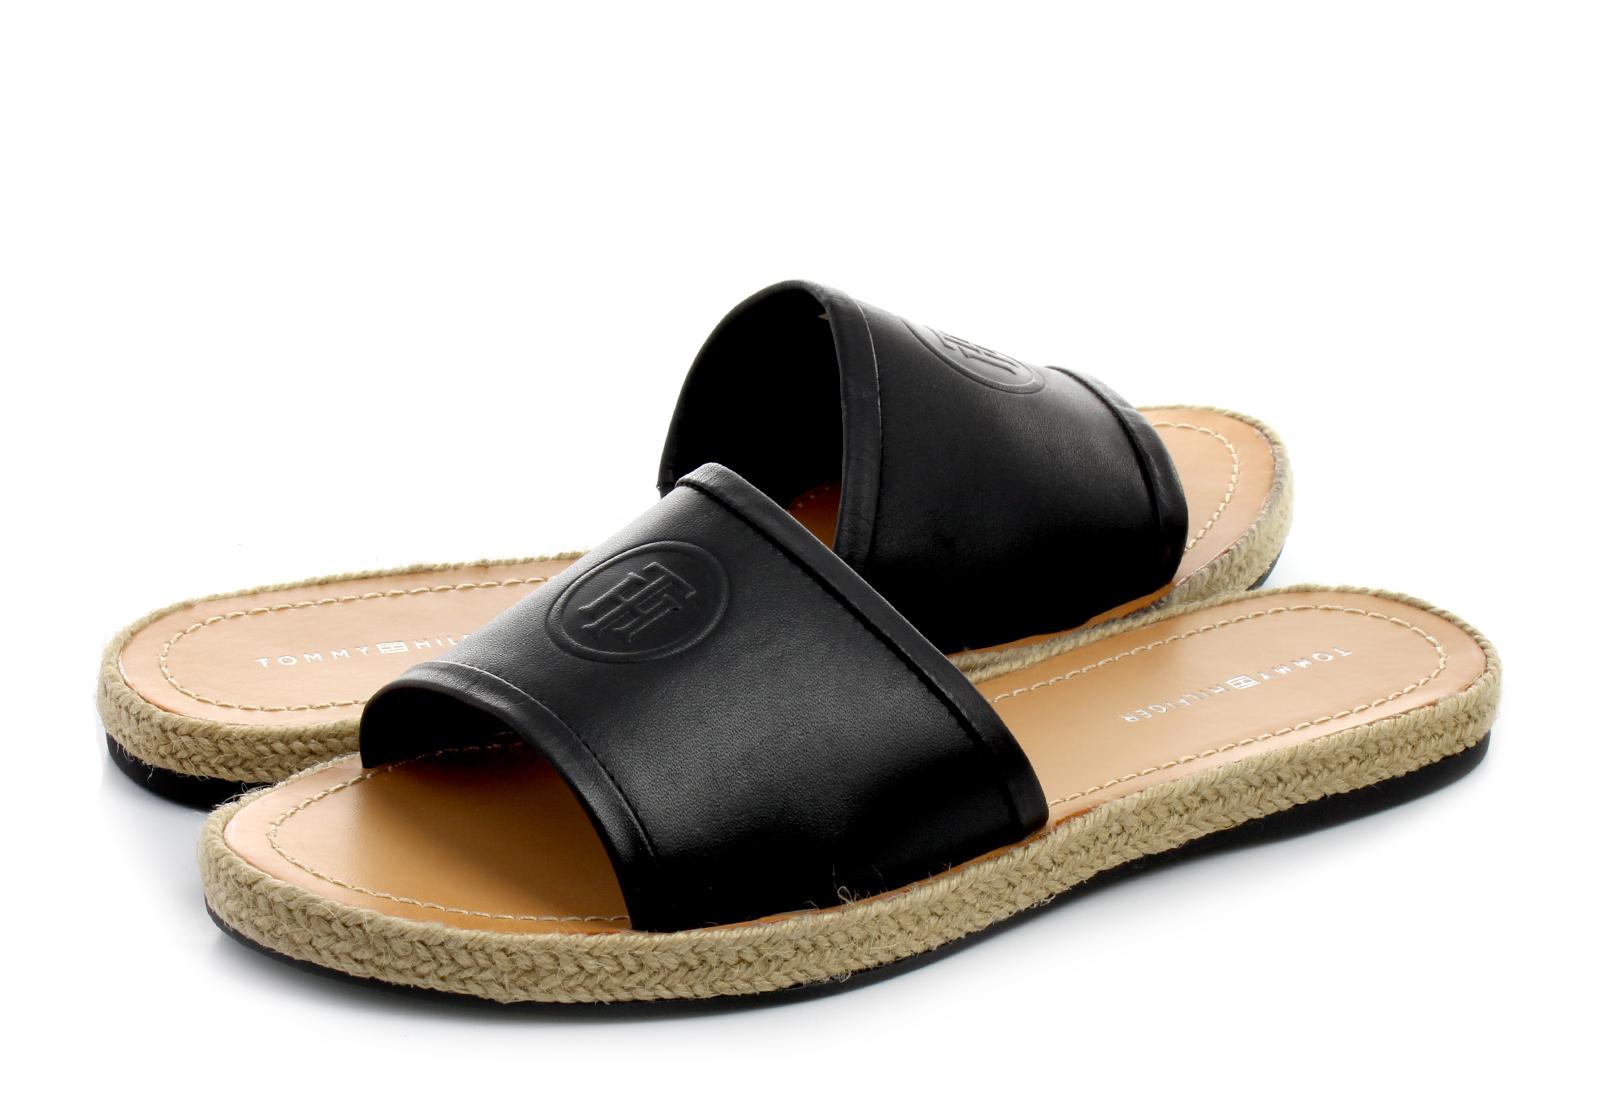 Tommy Hilfiger Papucs - Joyce 1 - 18S-2790-990 - Office Shoes ... 024974cc33